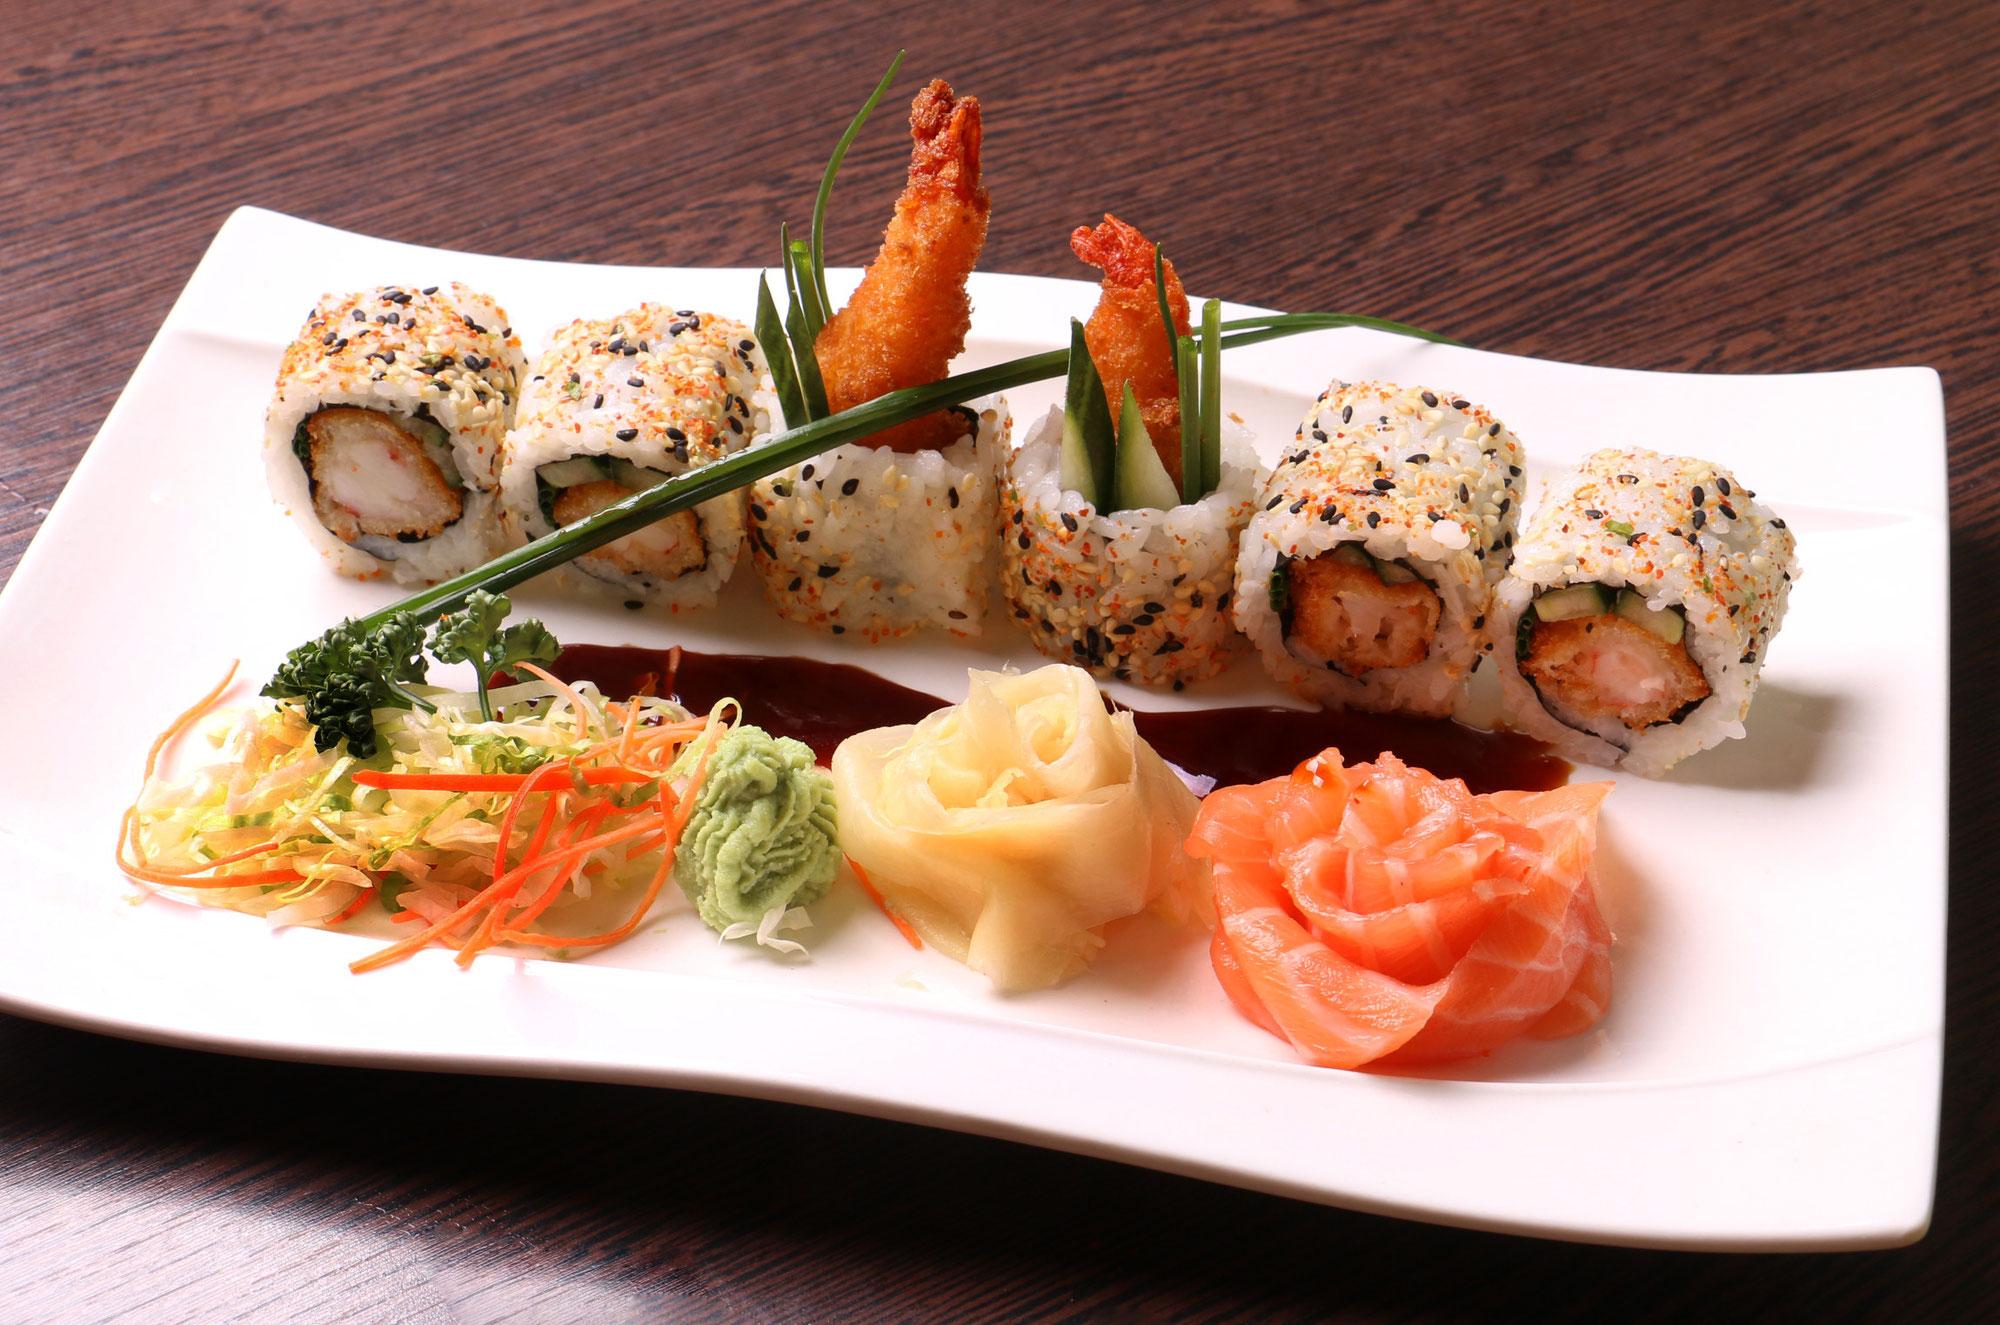 Art Cuisine | Asia Cuisine Sushi Bar Fur Jeden Geschmack Etwas Dabei